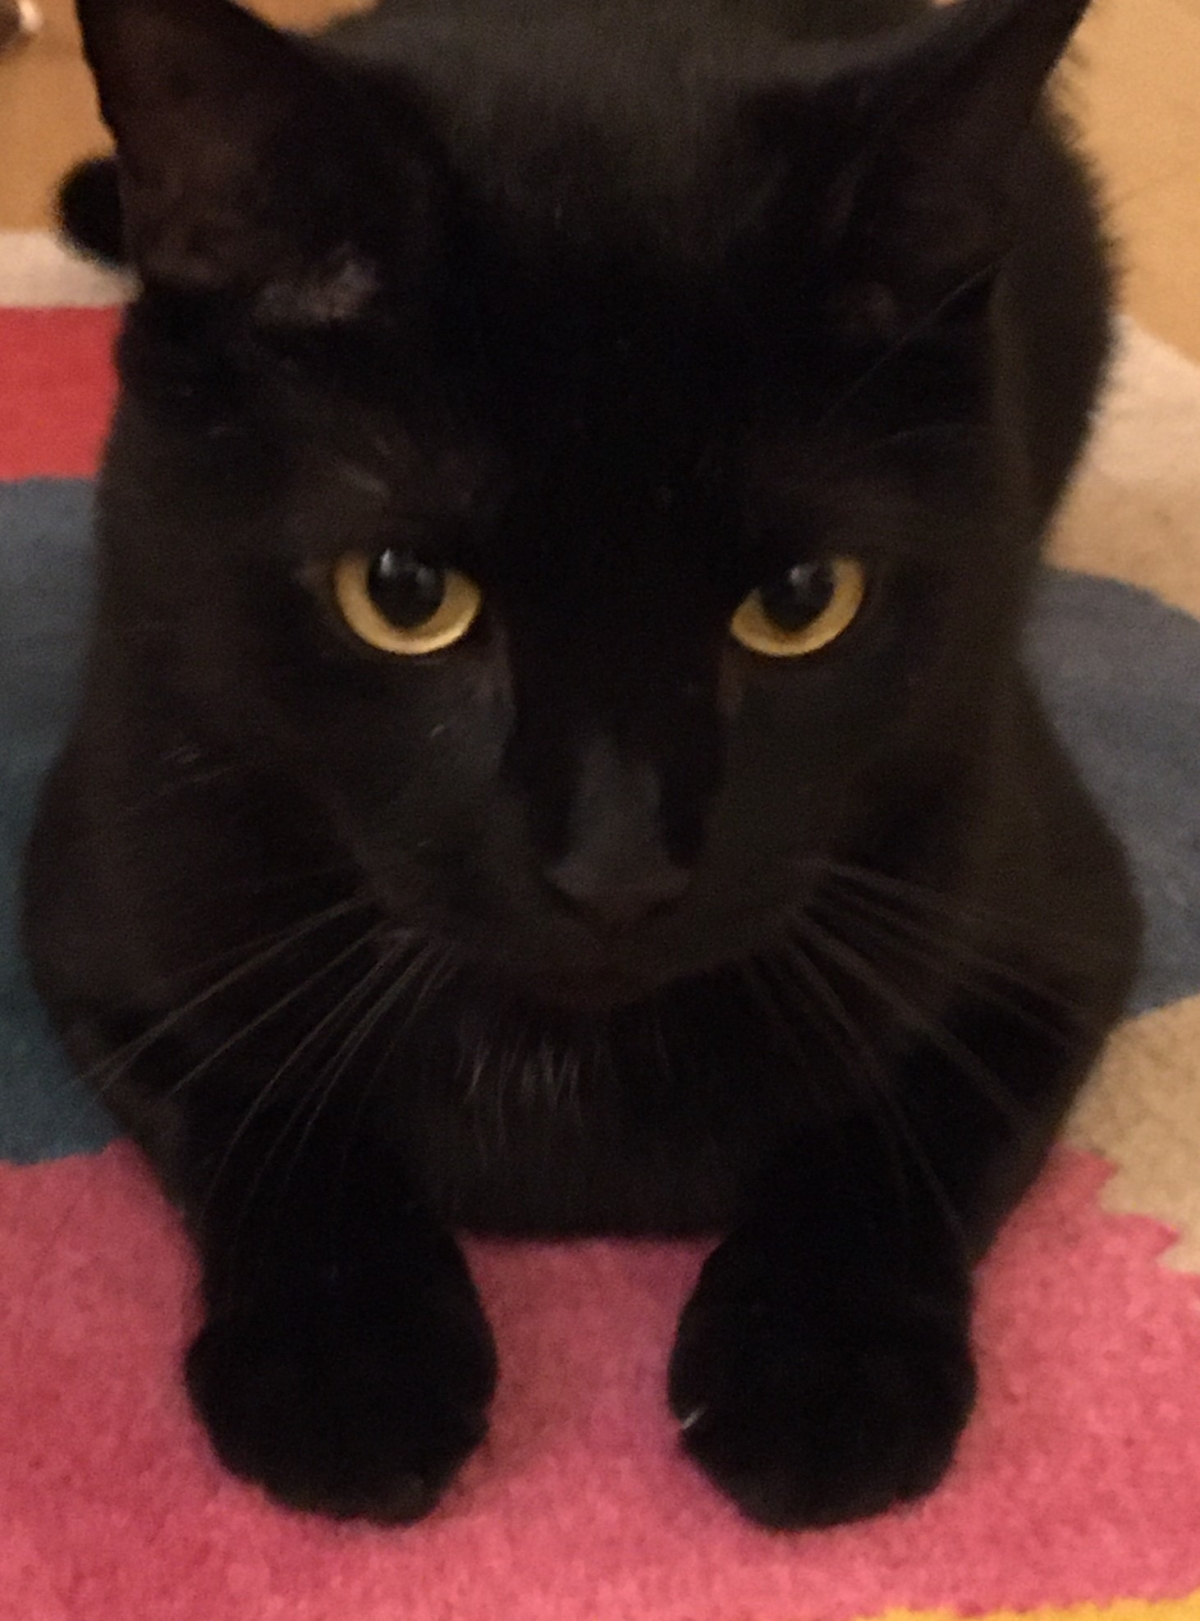 WINTER DANGER TO CATS